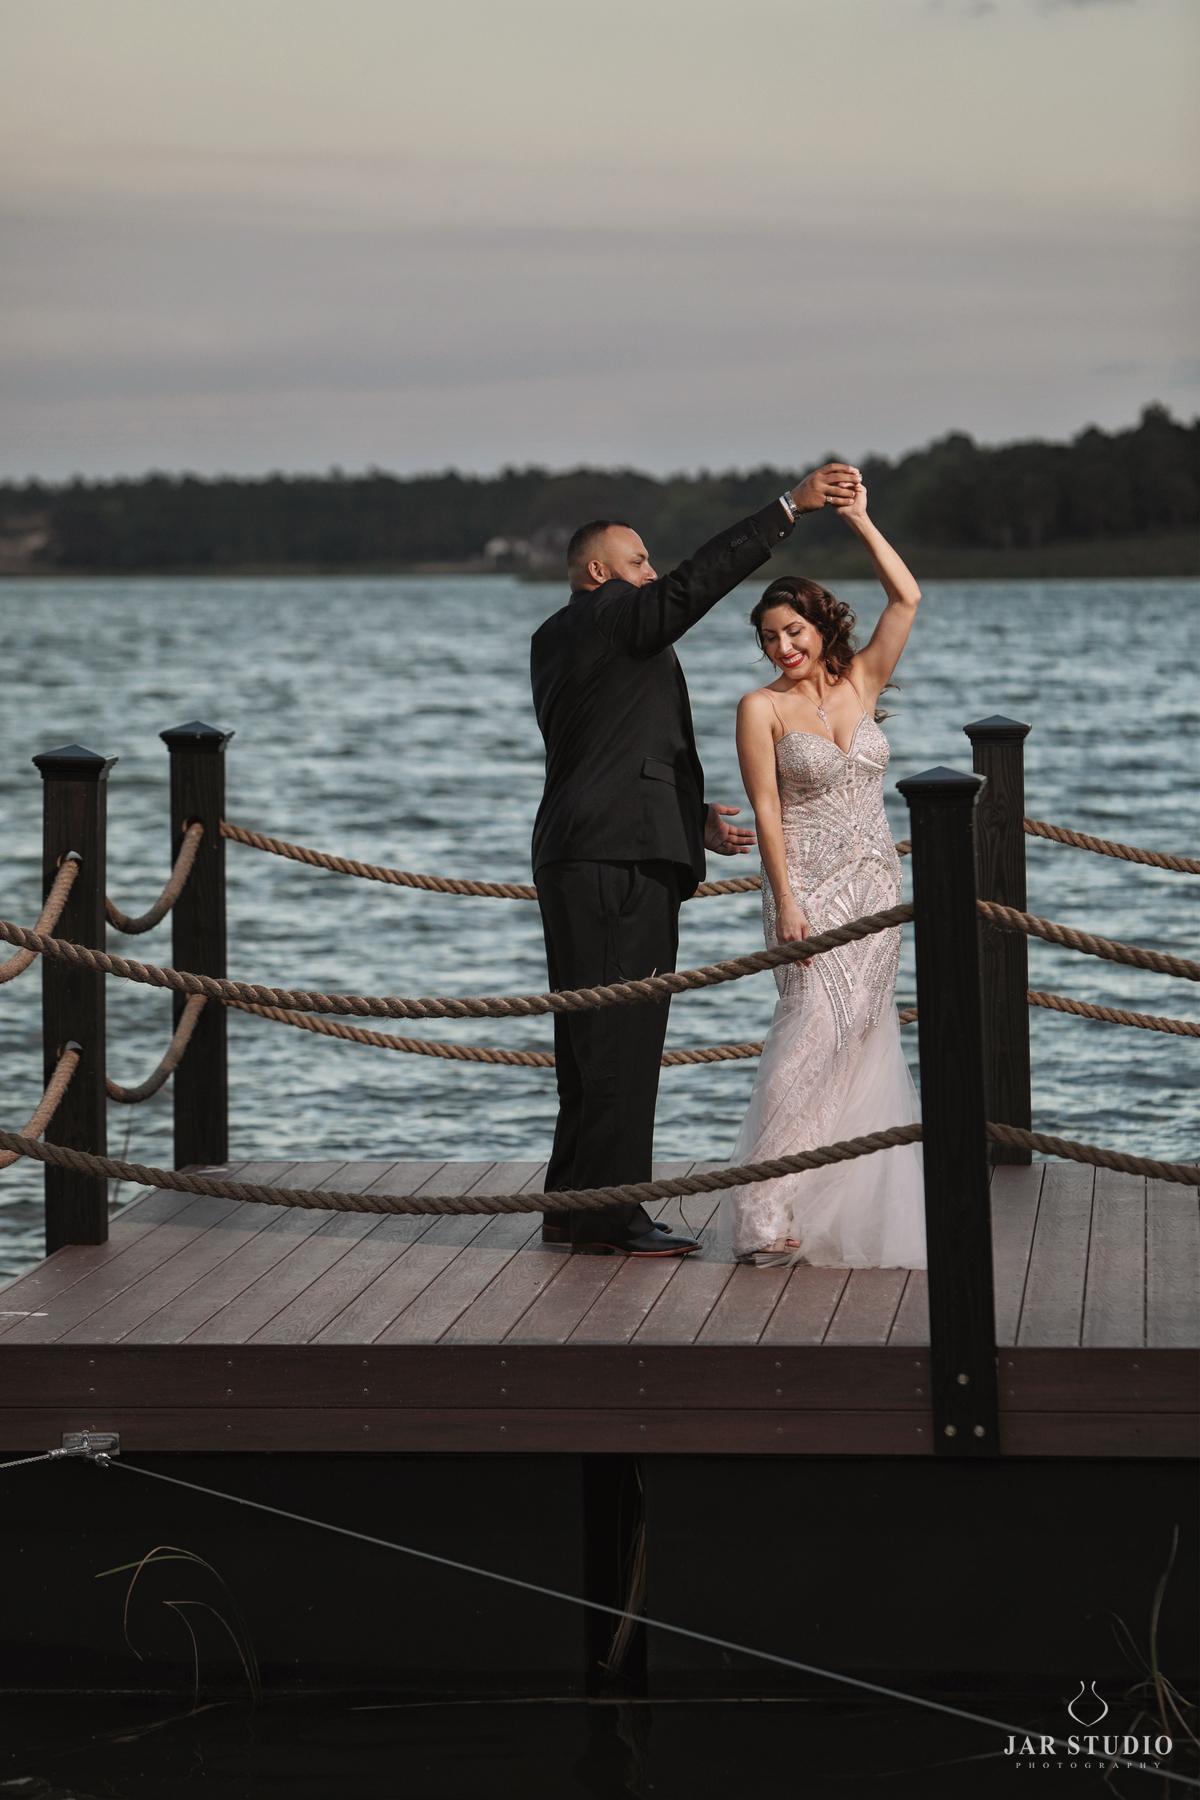 26-fl-lake-wedding-photography-jarstudio.jpg